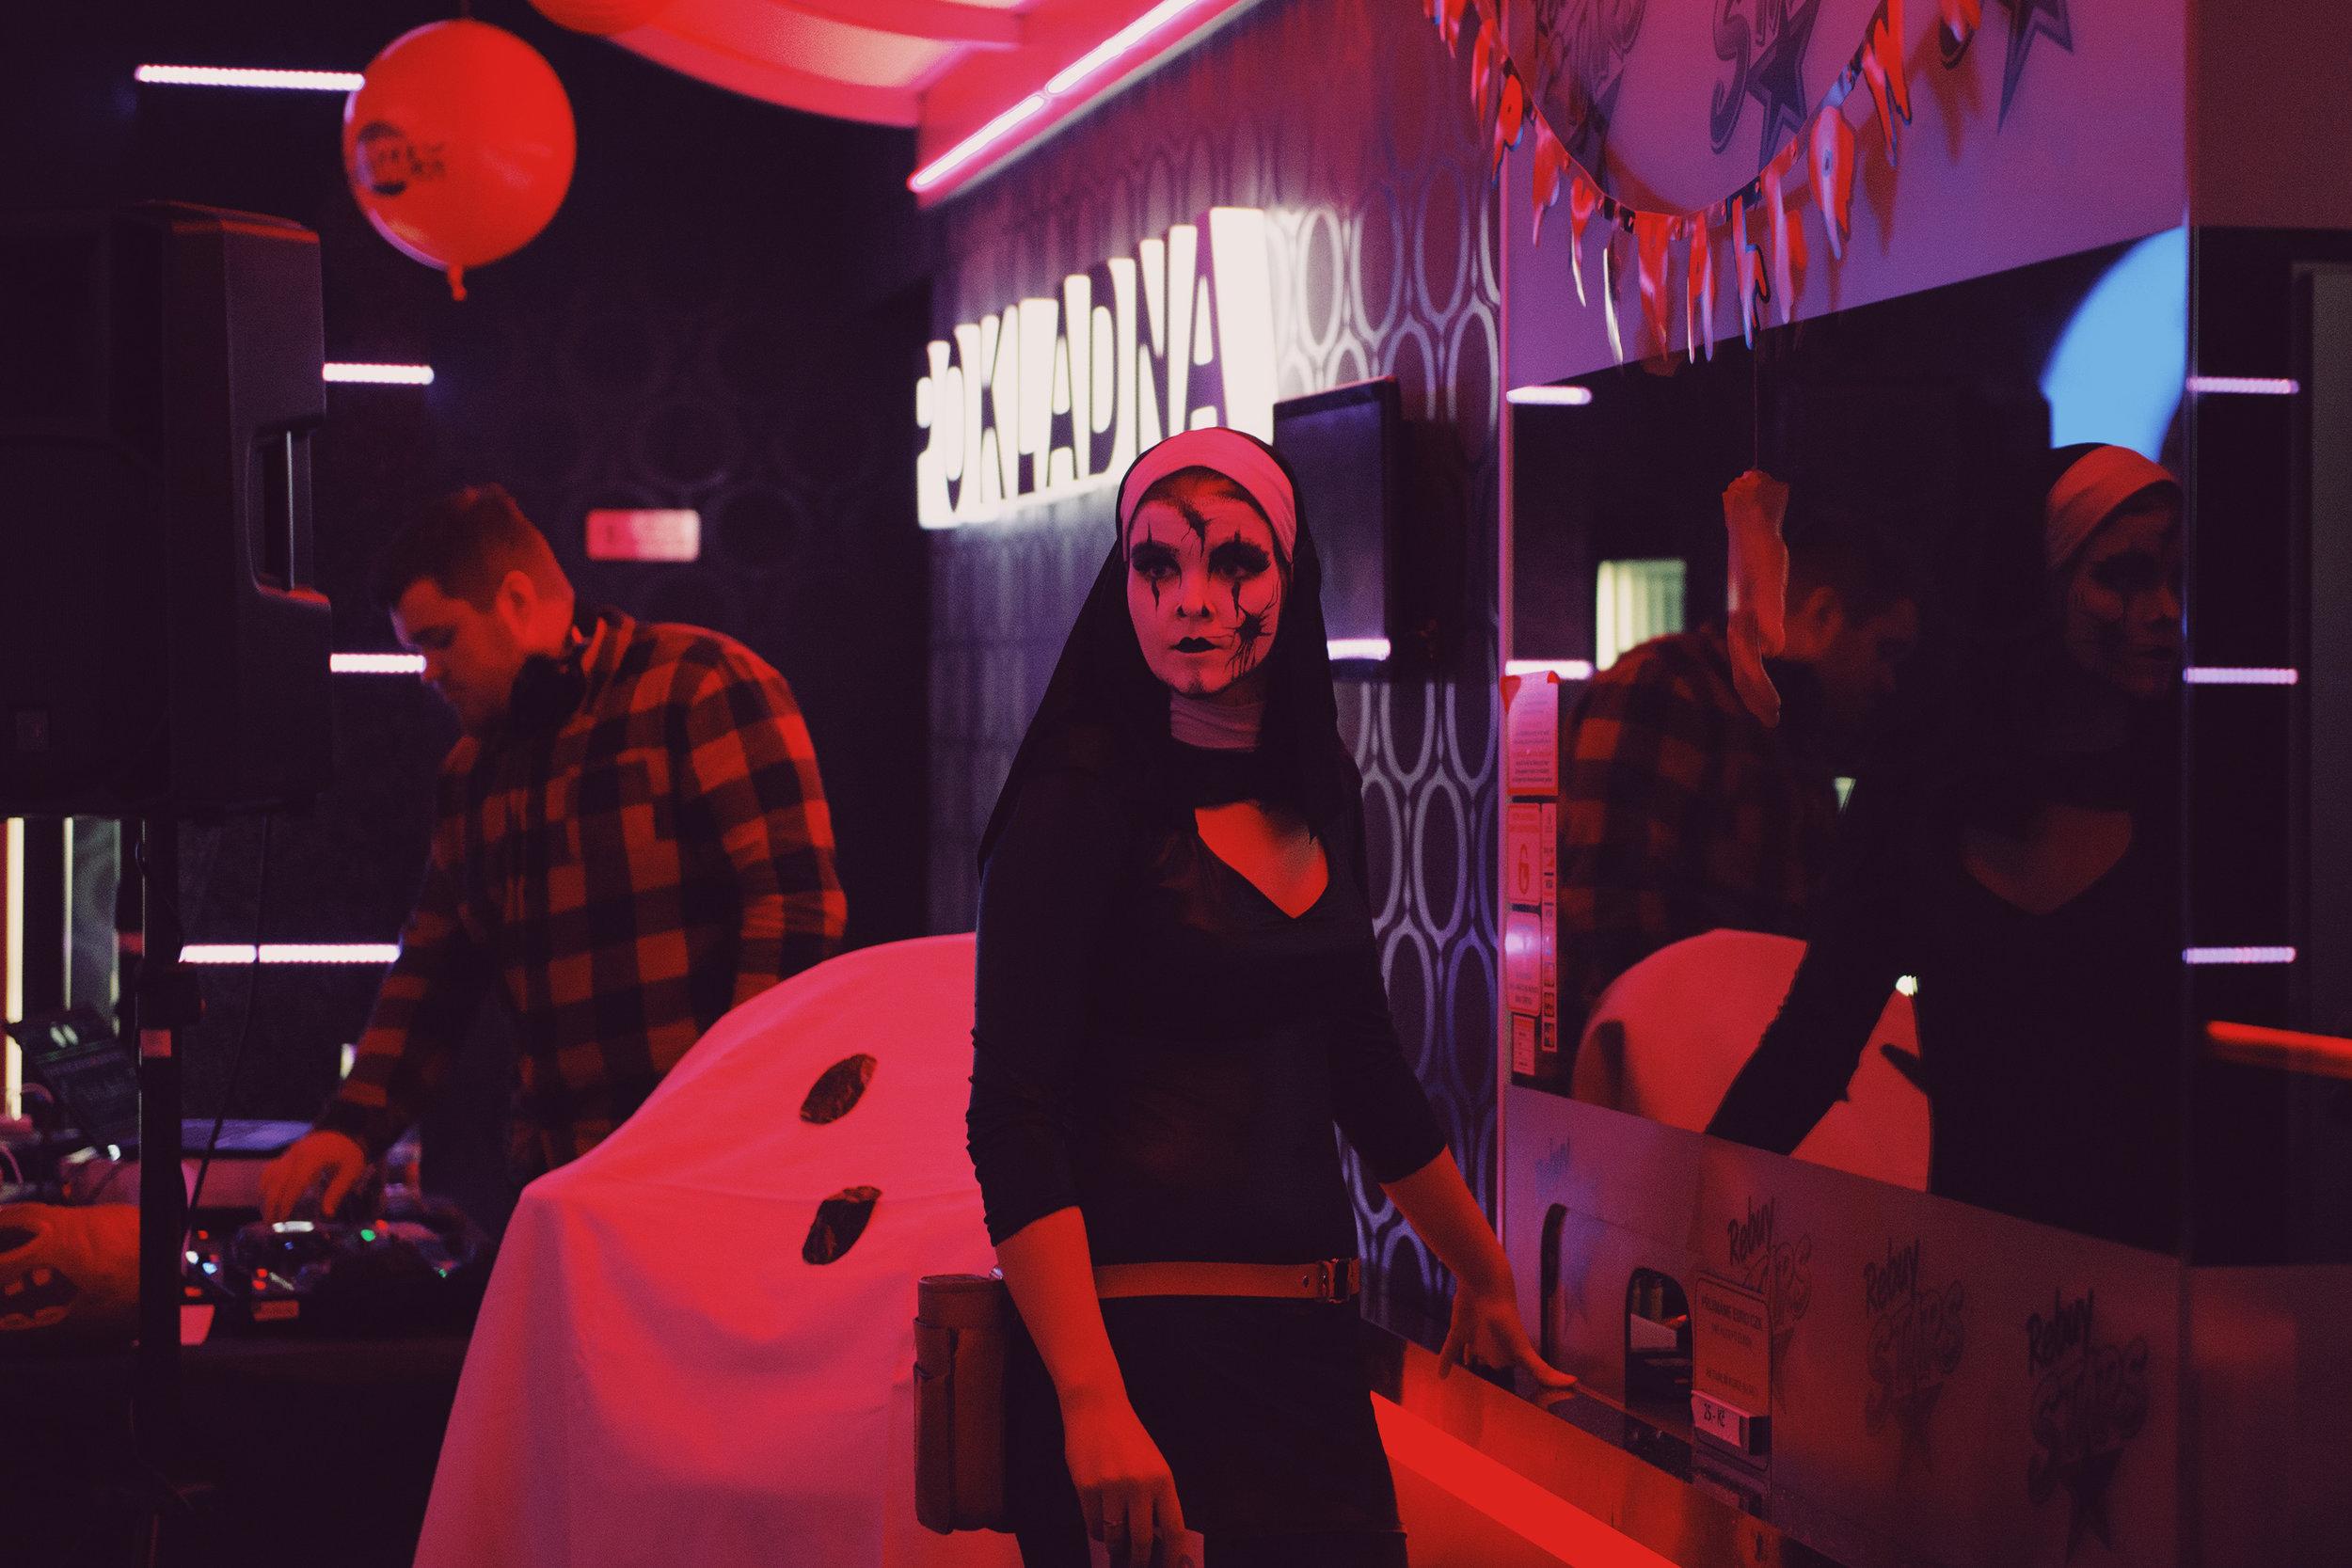 Poker-Photography-Europe-Polina-Shubkina-Casino-RebuyStars-007.JPG